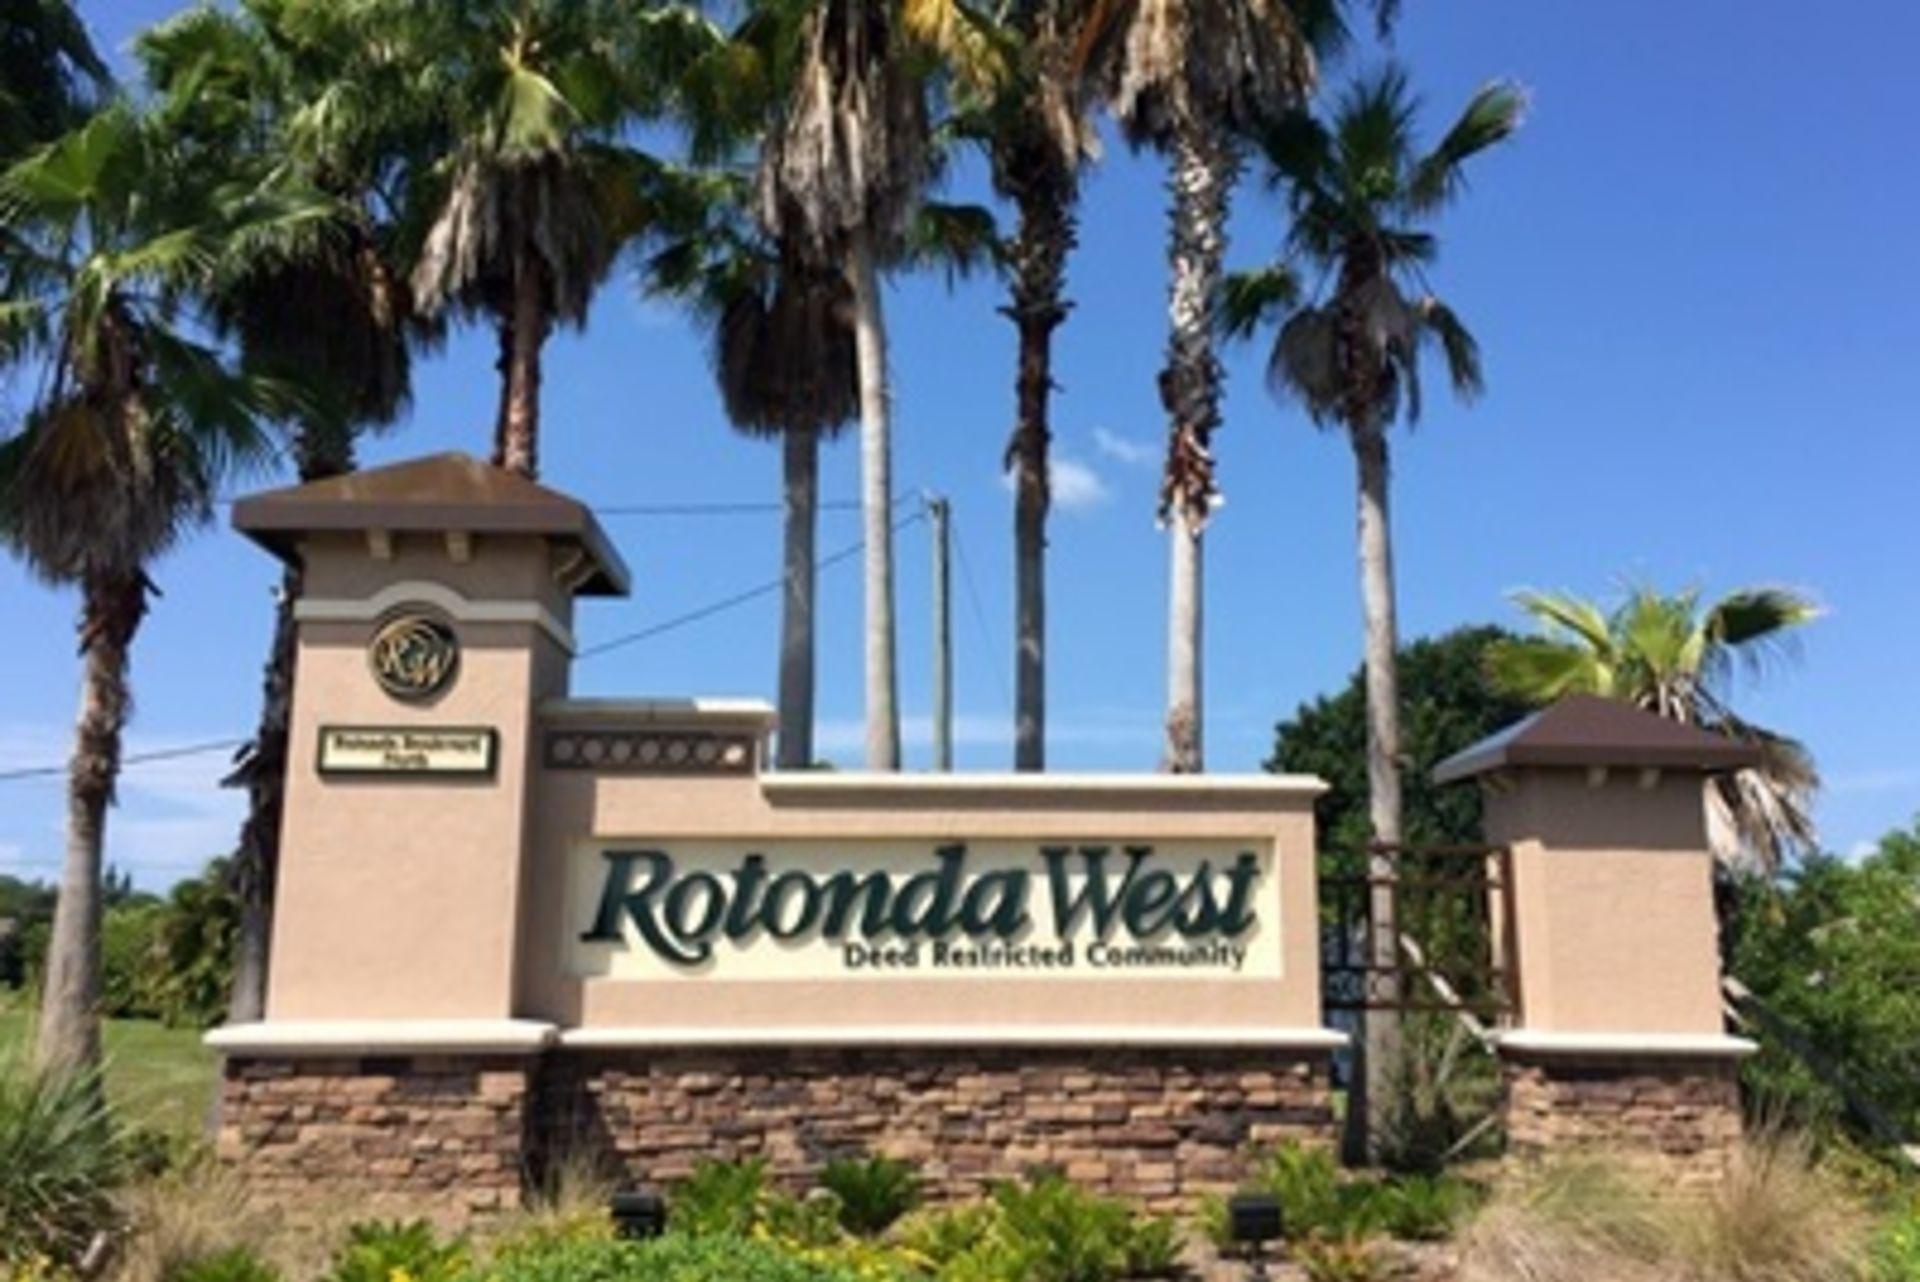 Rotonda West FL homes for sale